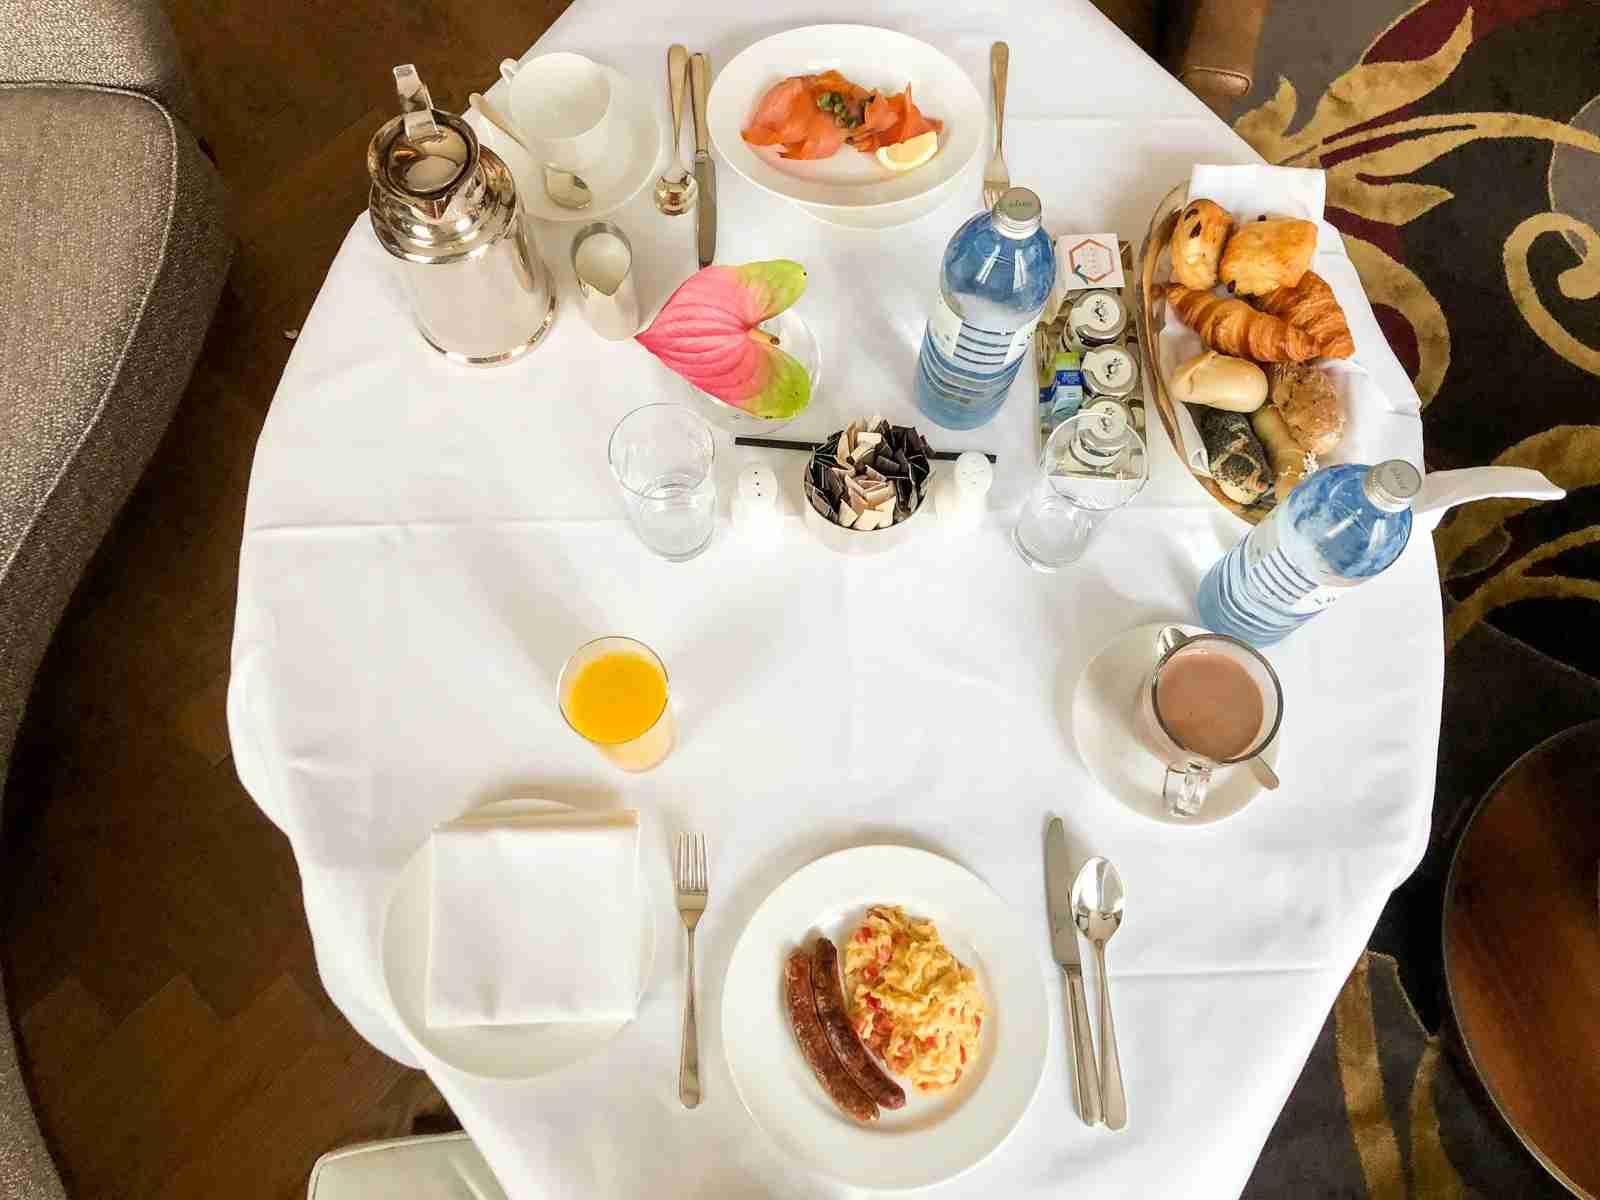 Free room service breakfast at the Park Hyatt Vienna thanks to Hyatt Globalist status